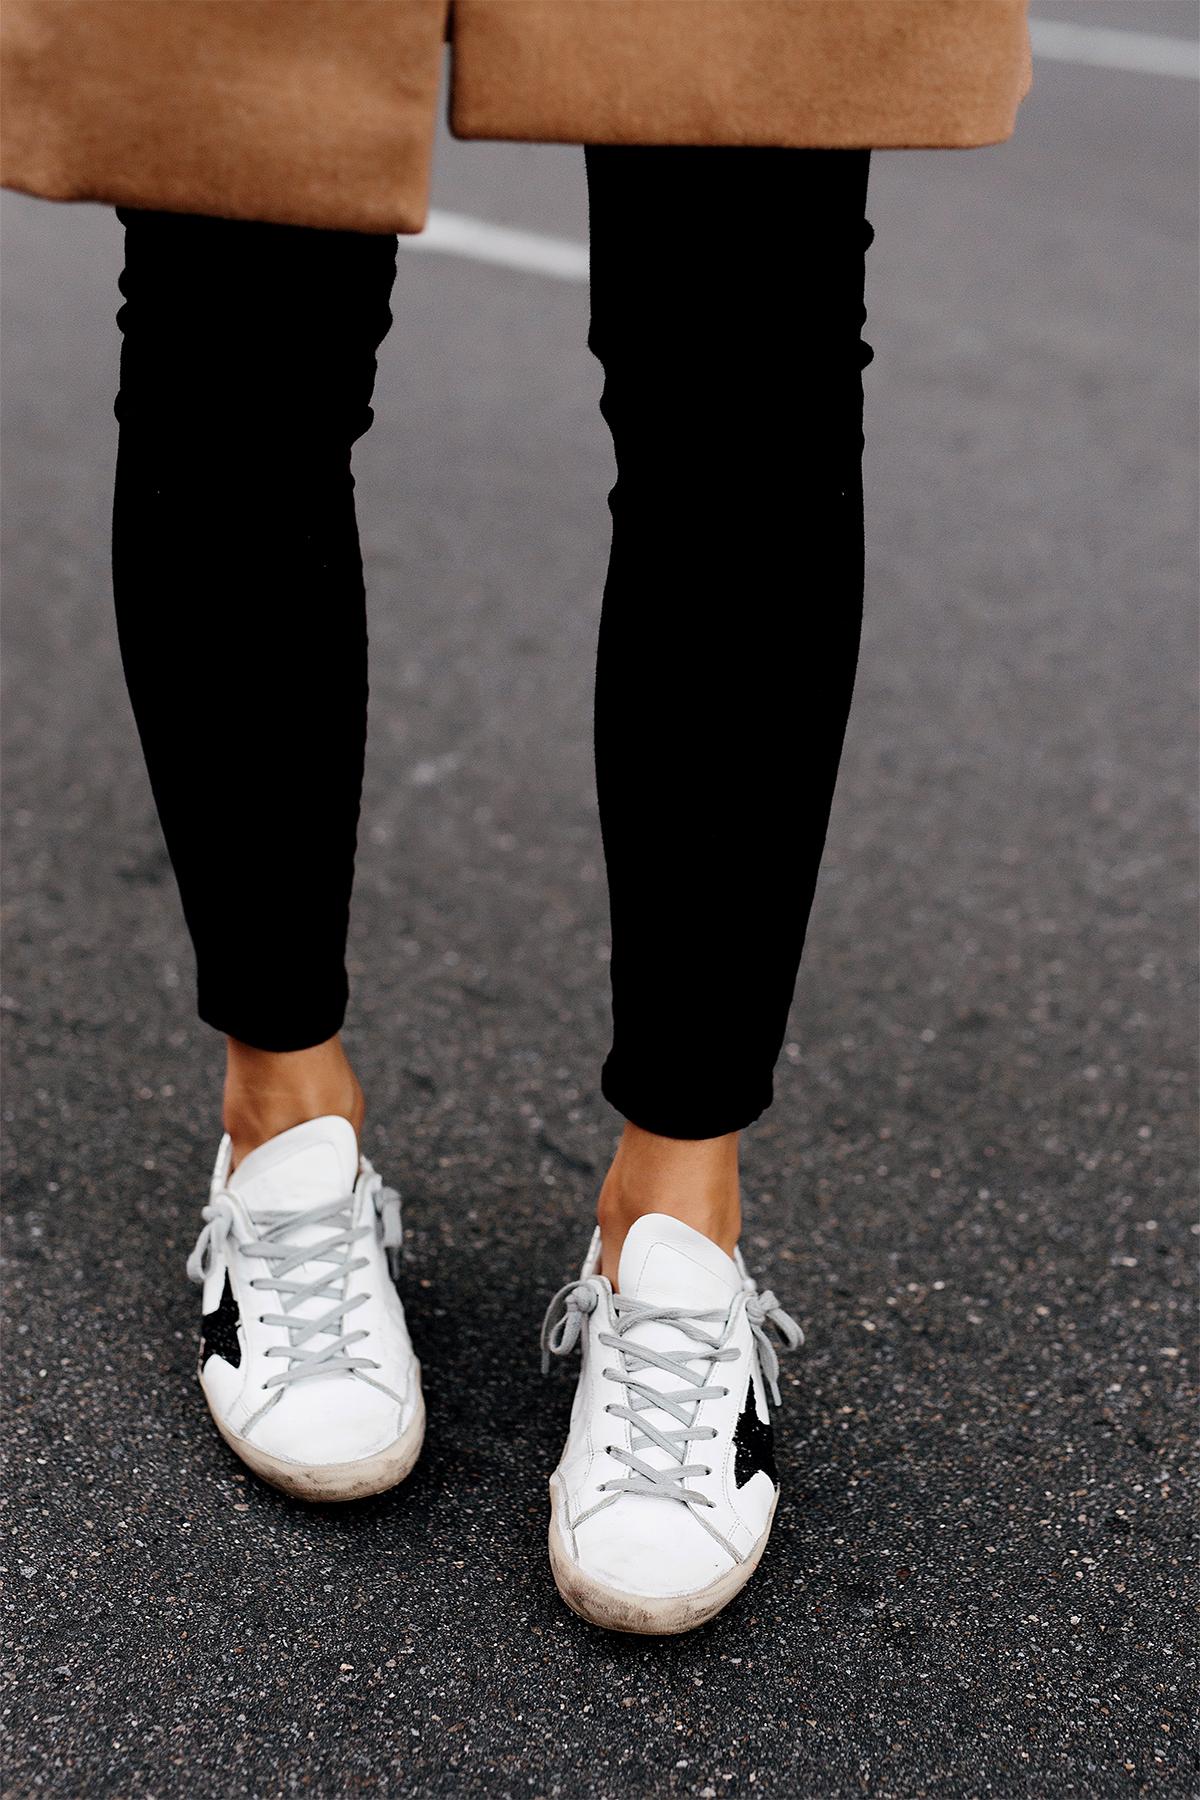 Fashion Jackson Wearing Black Skinny Jeans Golden Goose Deluxe Sneakers